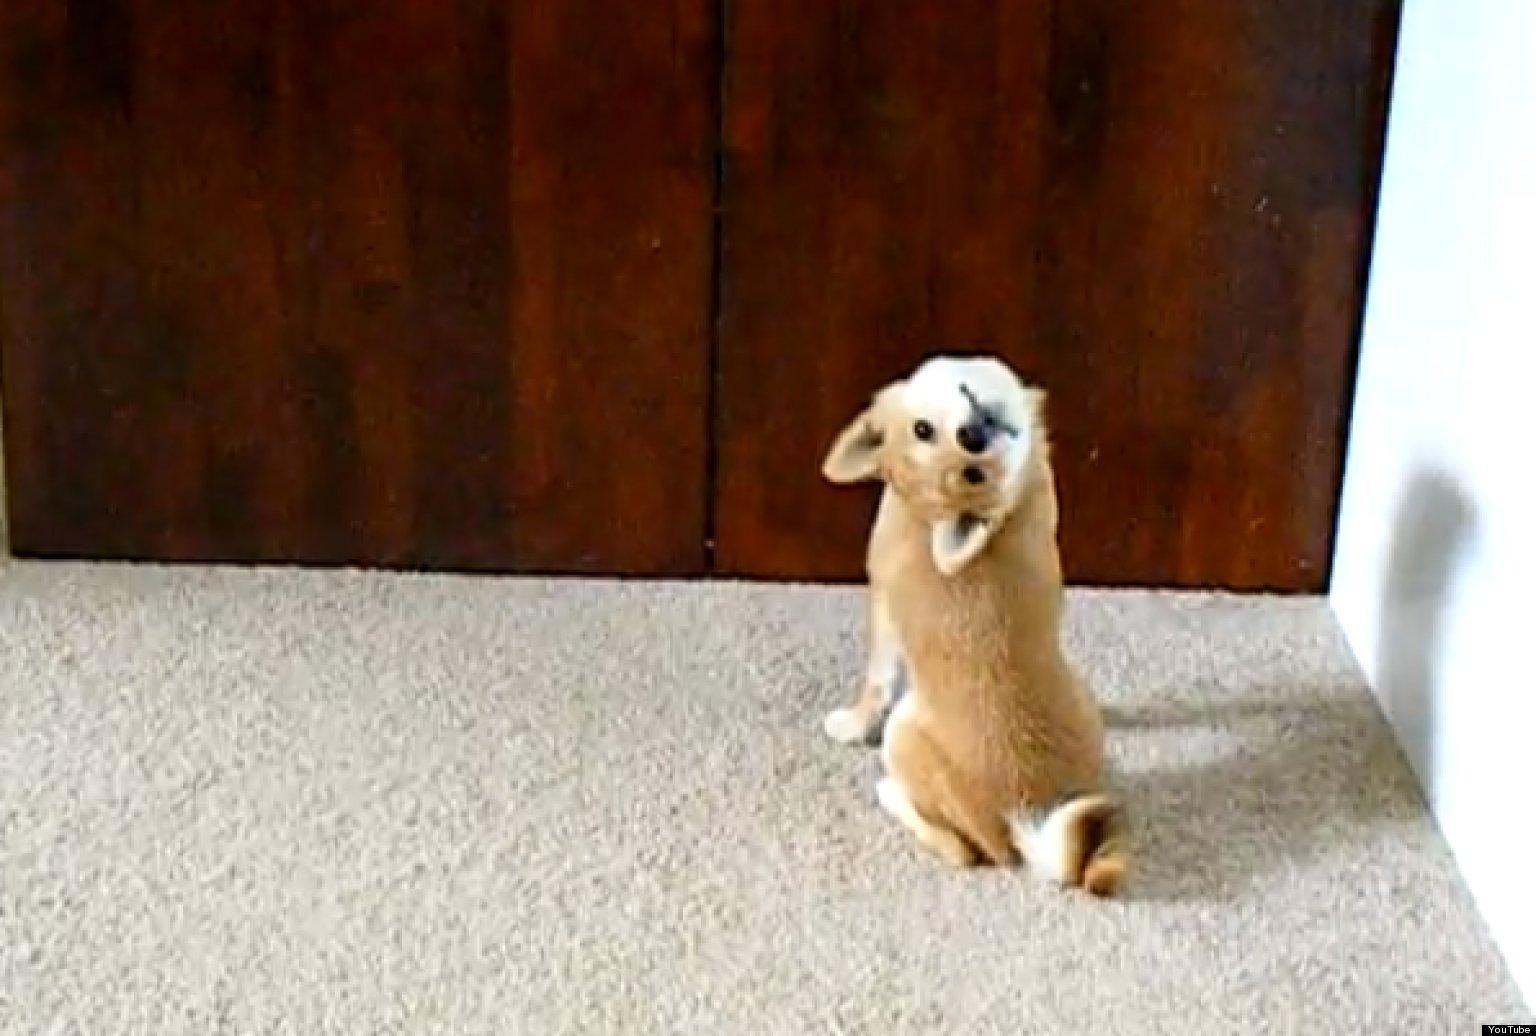 Shiba Inu Cute Desktop Wallpaper Shiba Inu Puppy Imitates A Bat Backwards Look Is Adorably